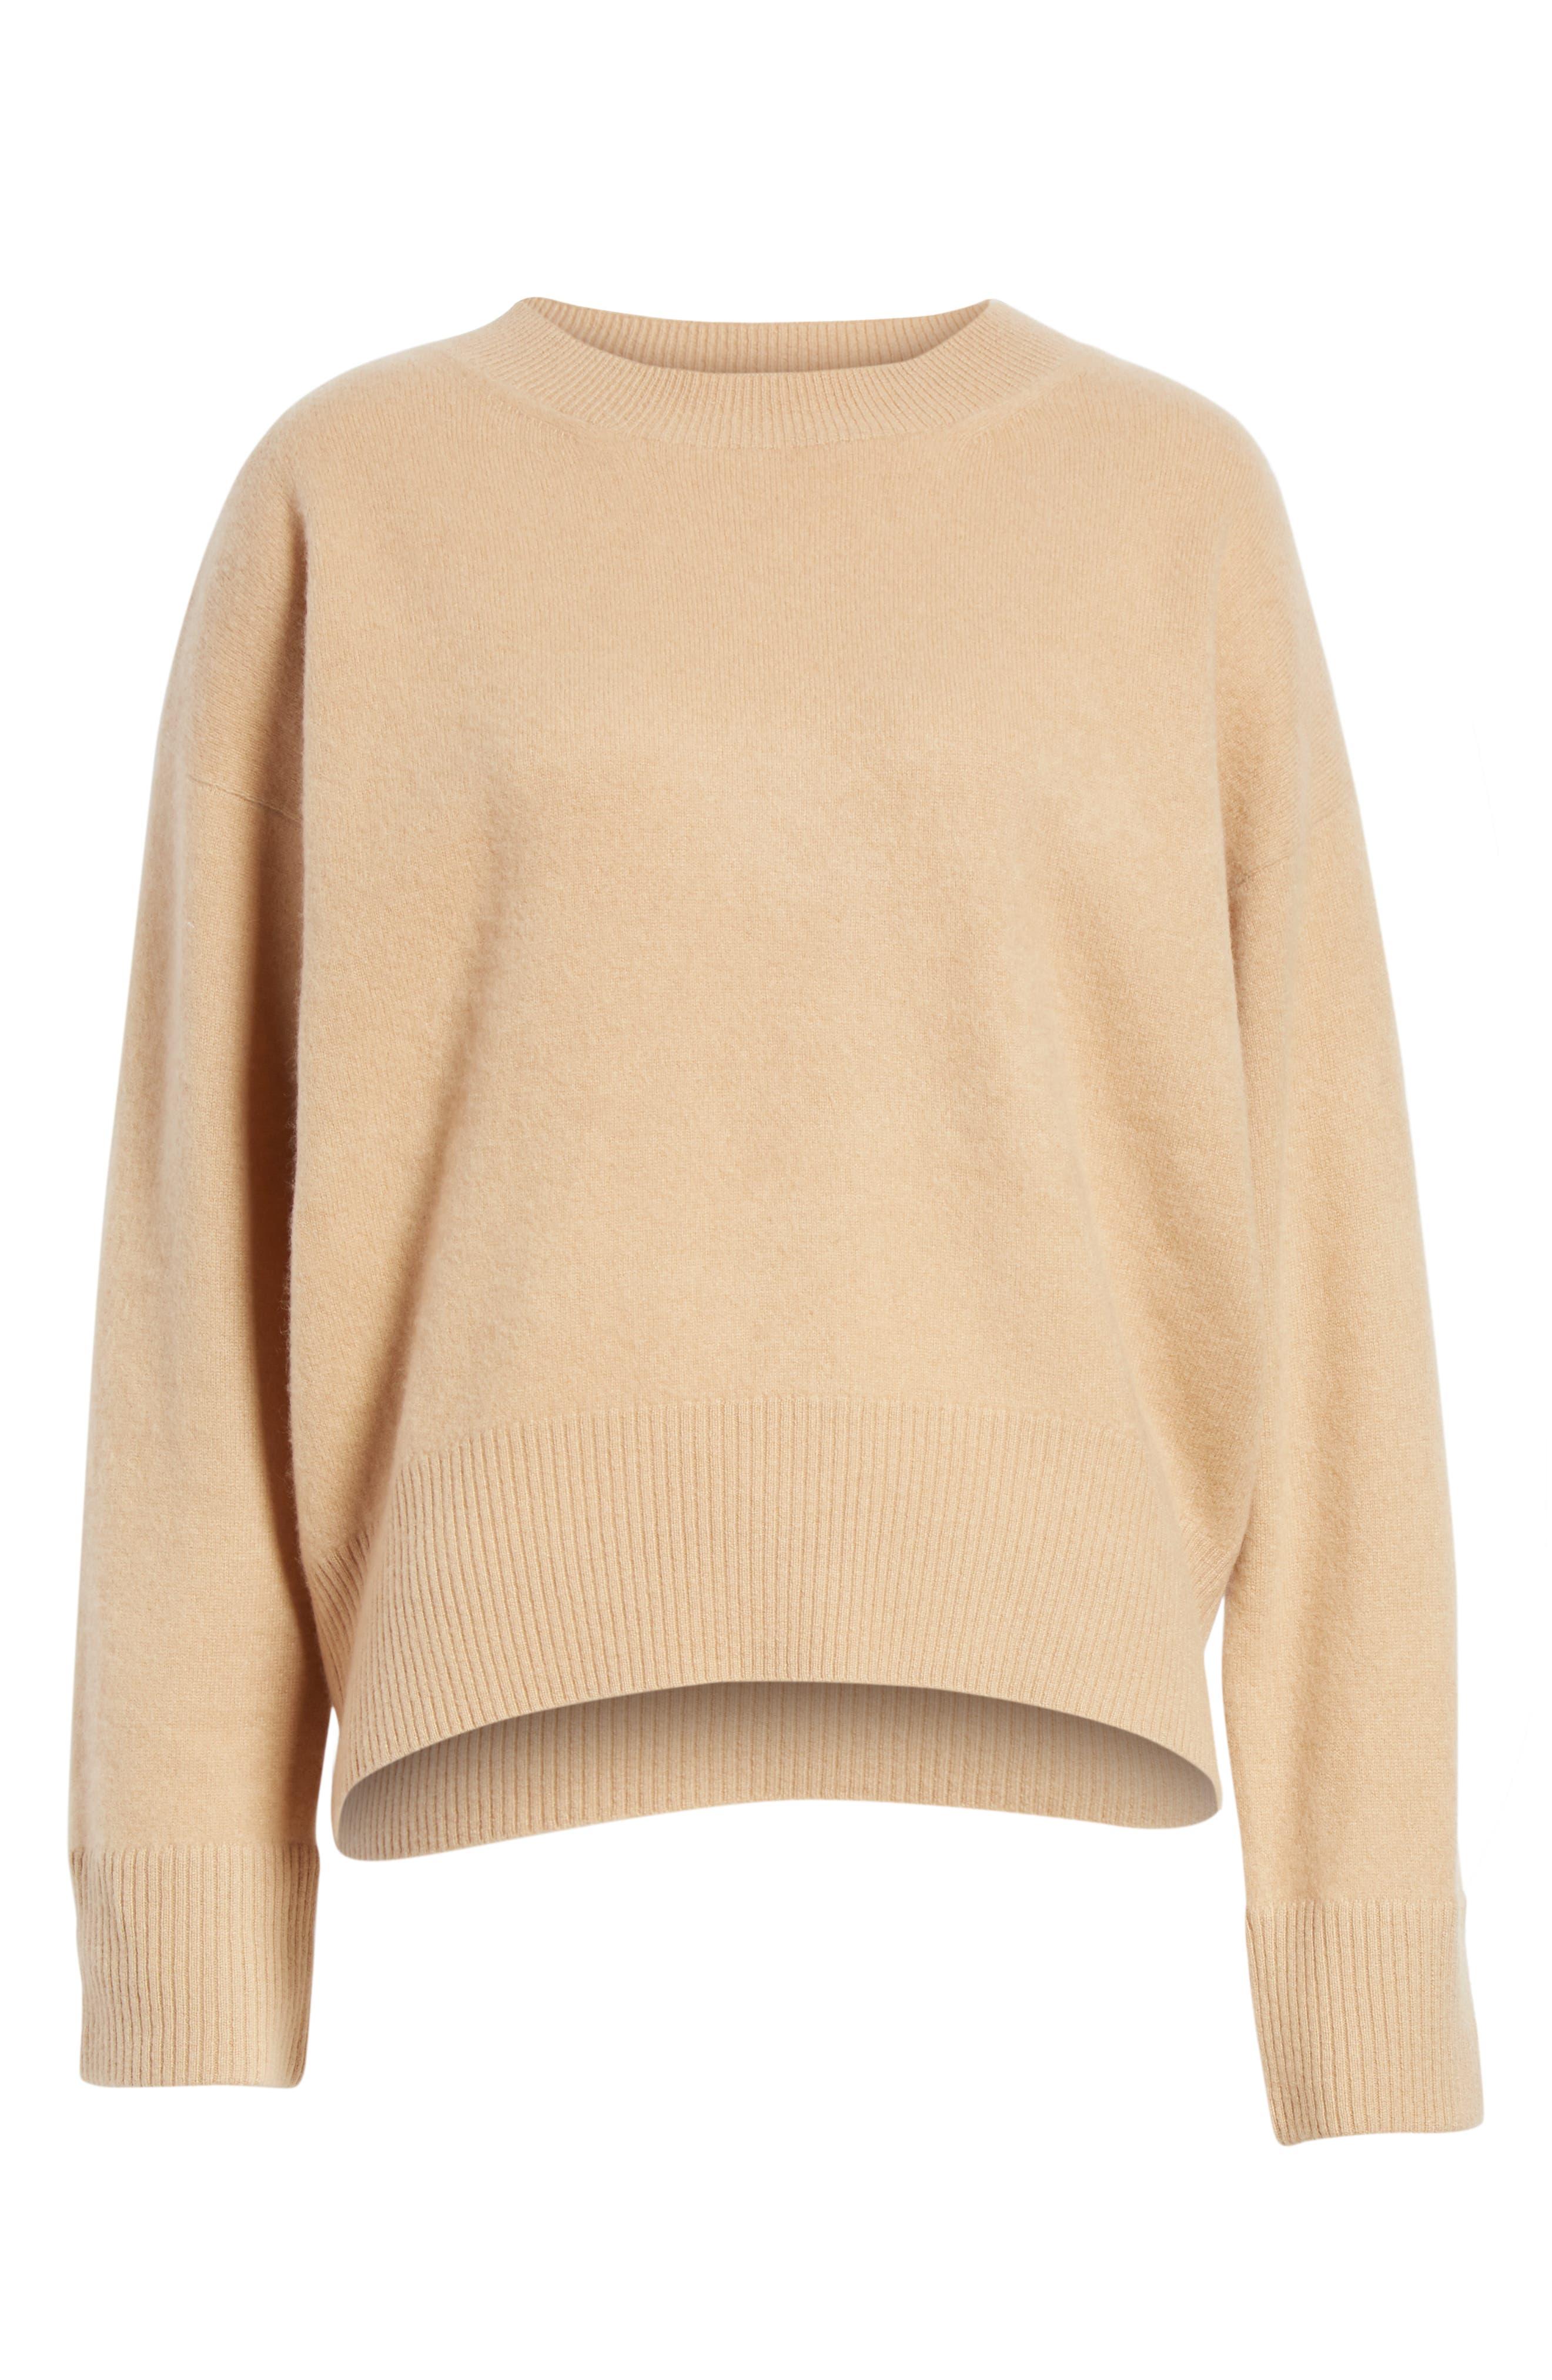 Cashmere Oversize Sweater,                             Alternate thumbnail 6, color,                             203